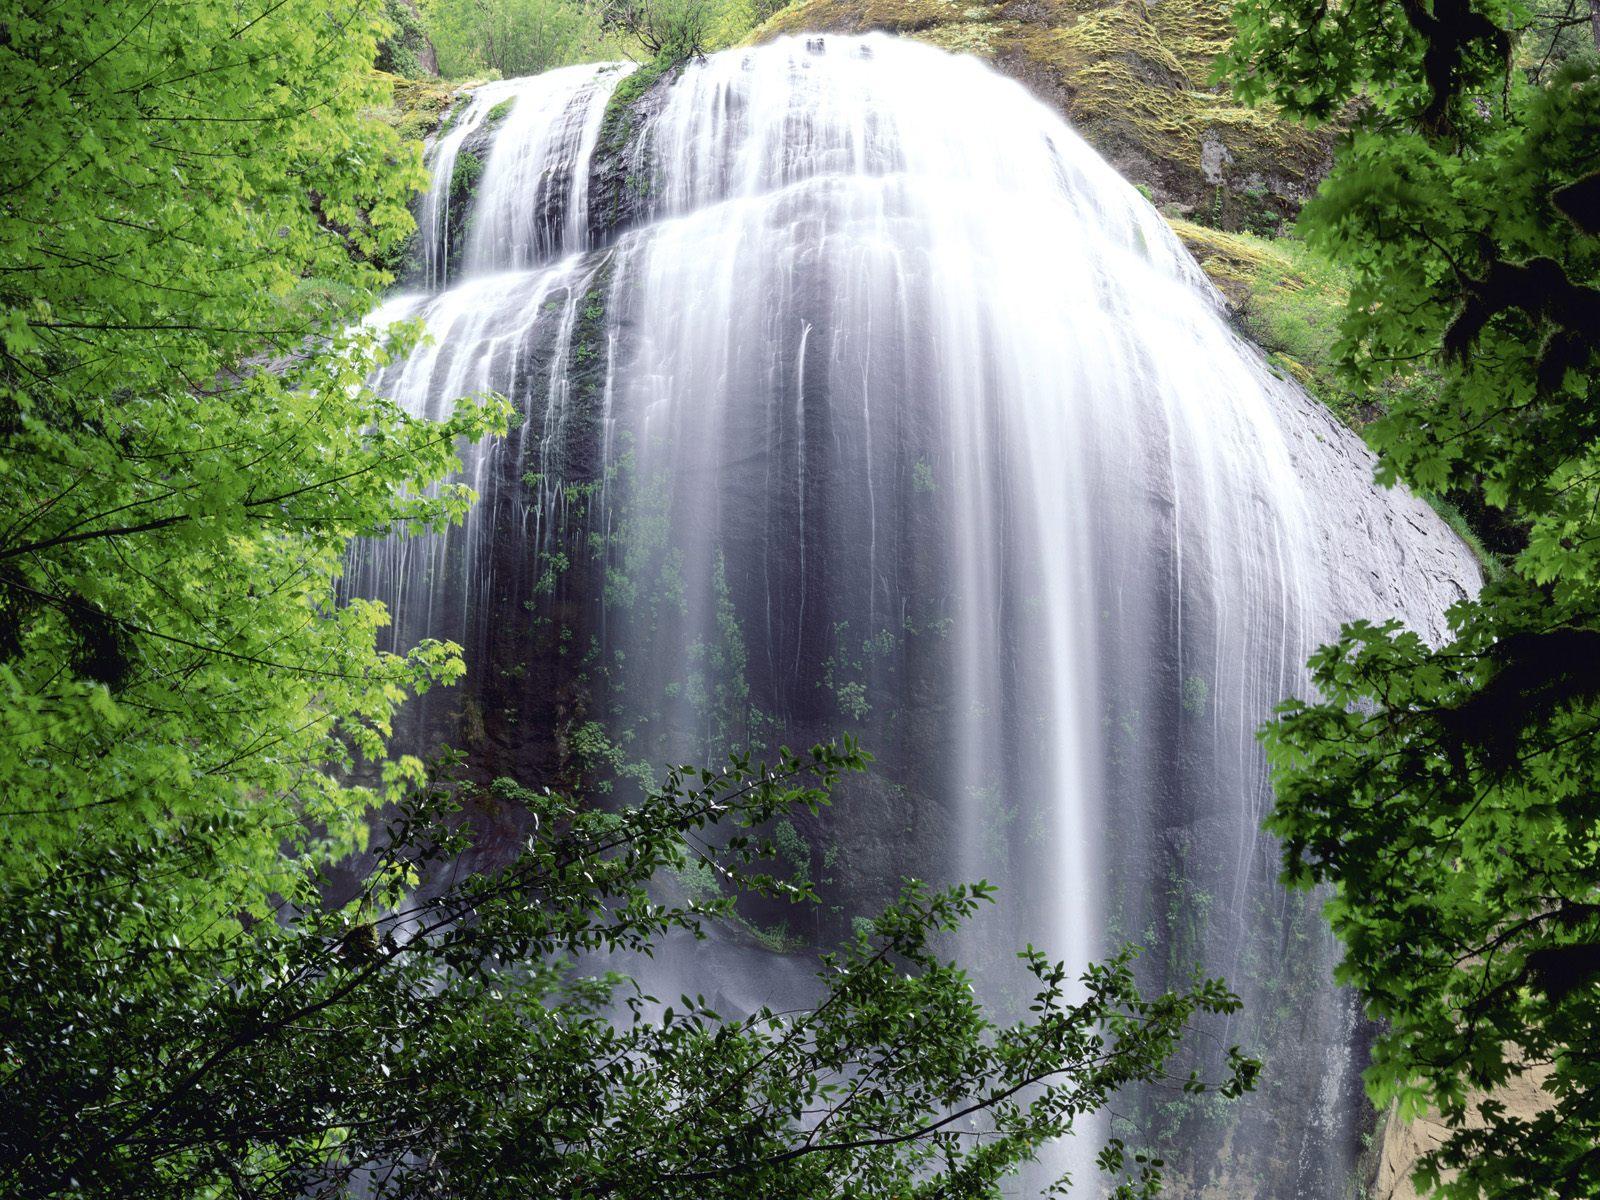 Pemandangan Air Terjun 15 Dunia Pengetahuan